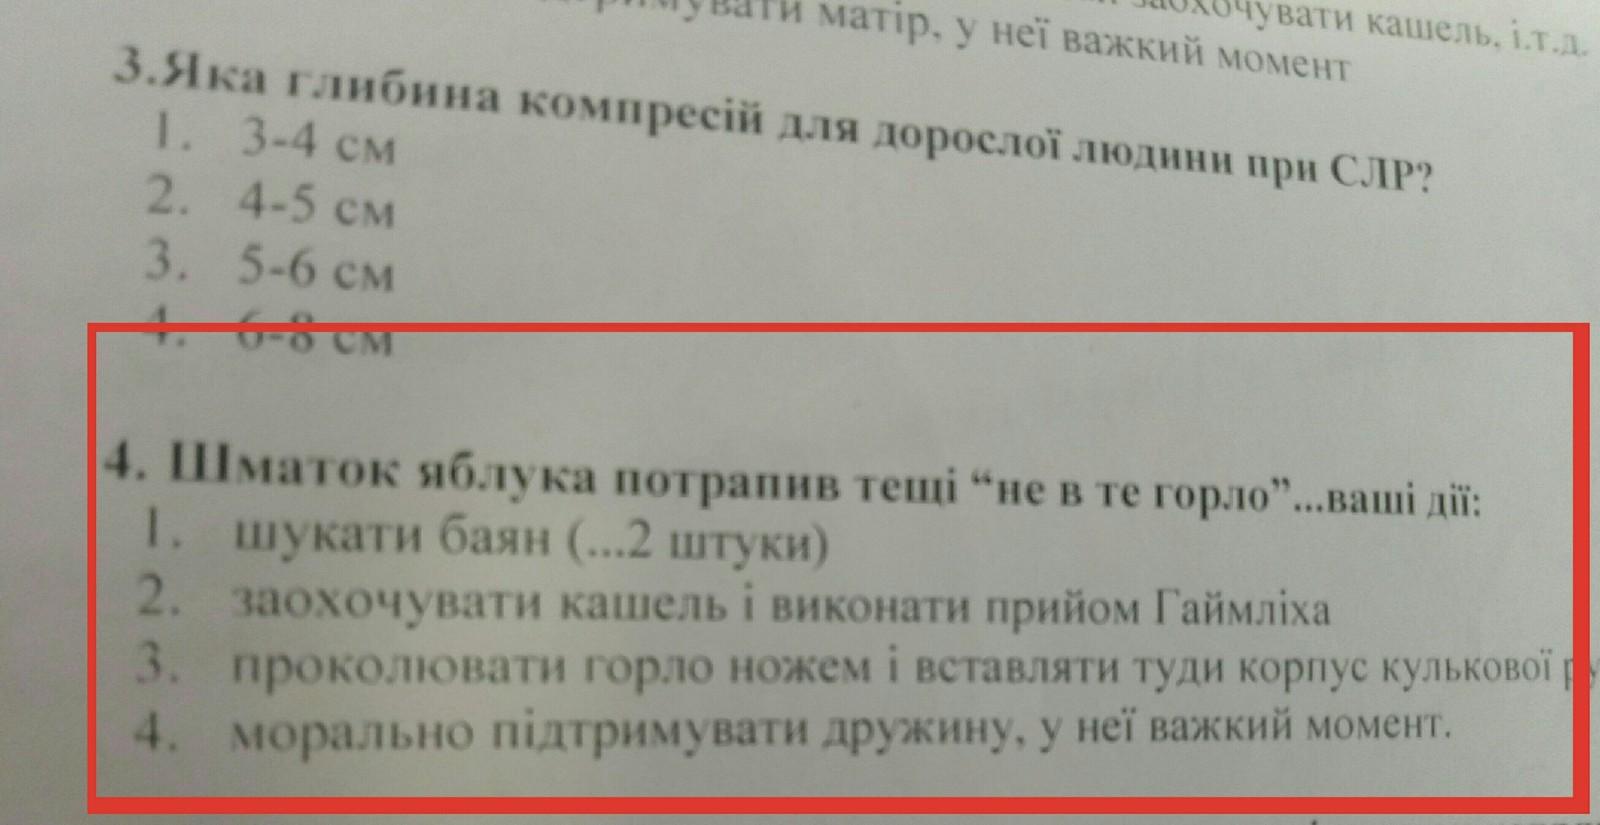 https://cs8.pikabu.ru/post_img/big/2018/01/24/12/1516825822196046758.jpg